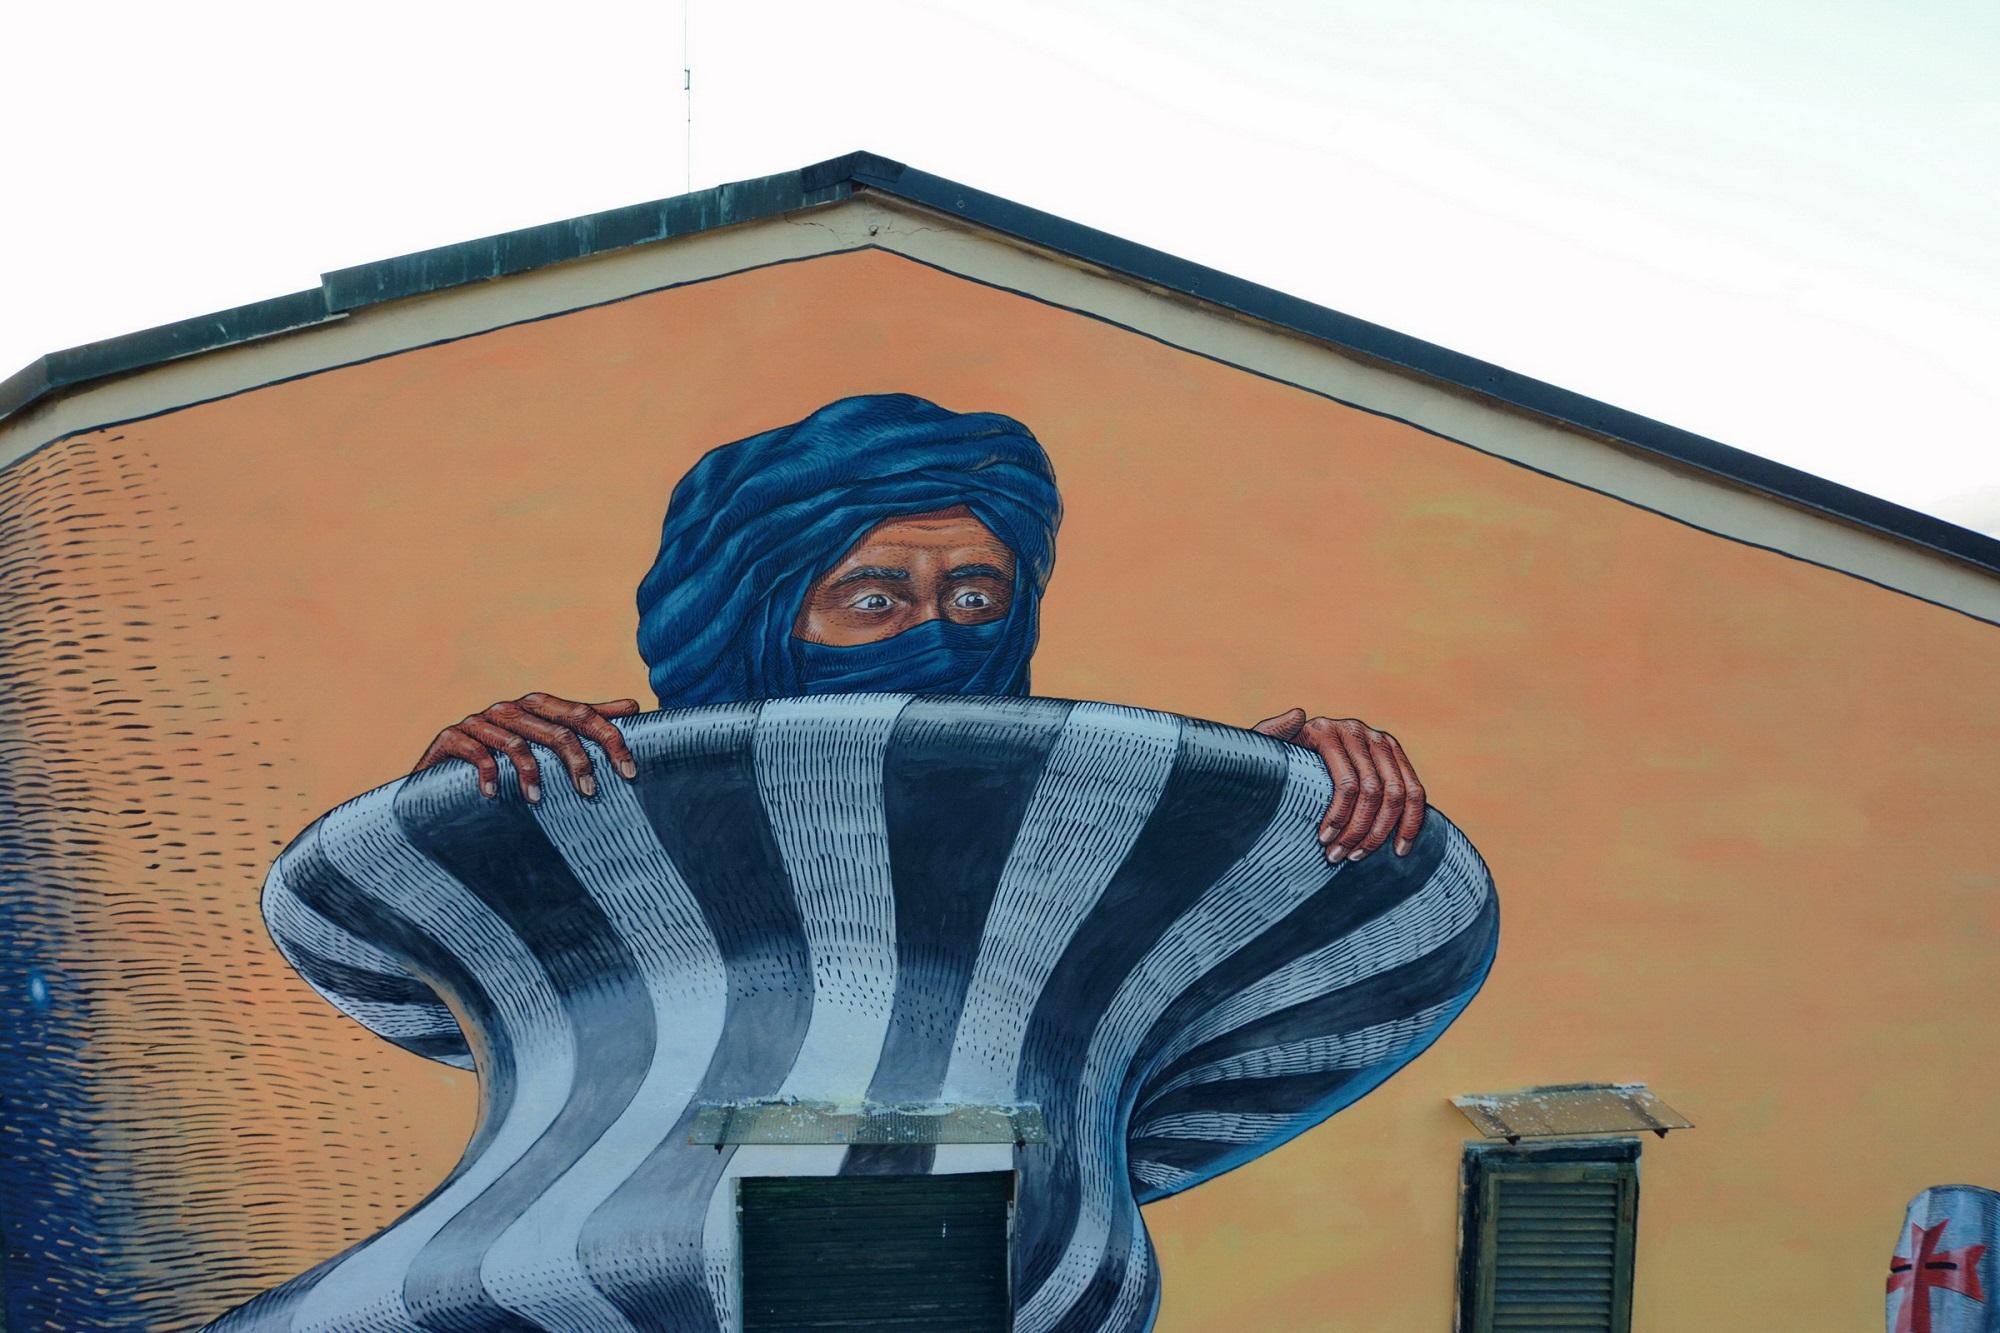 Aec Interesni kazki murale Pisa